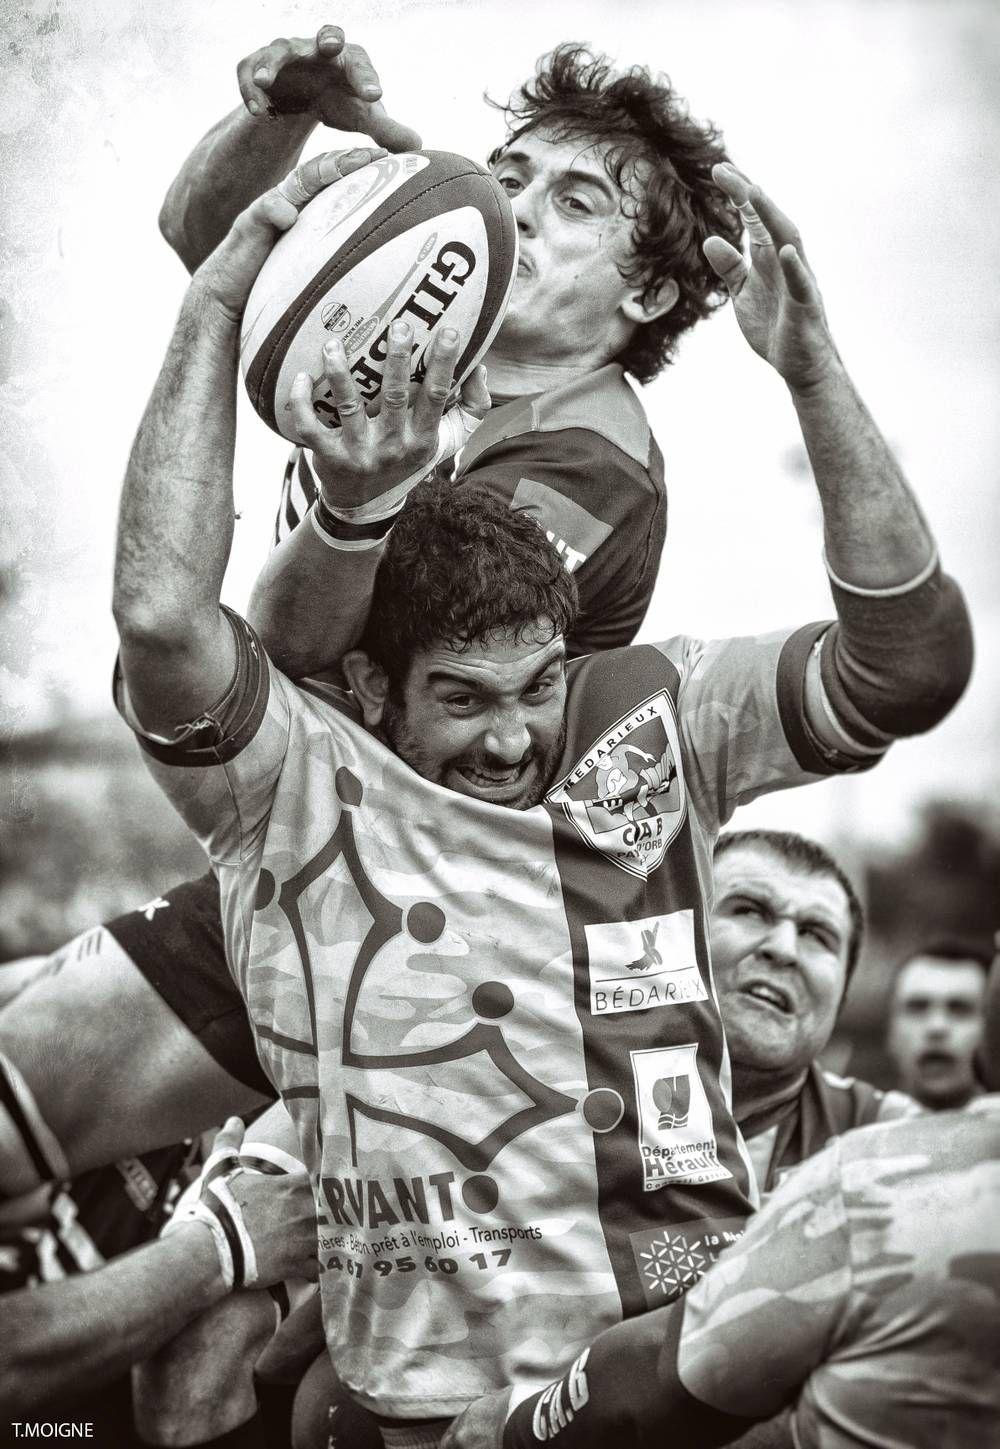 Rage Photo Noir Et Blanc Sport Photo Noir Et Blanc Rugby Deco Photo Photographie Artistique Rugby Rugby Sport Sports Pictures